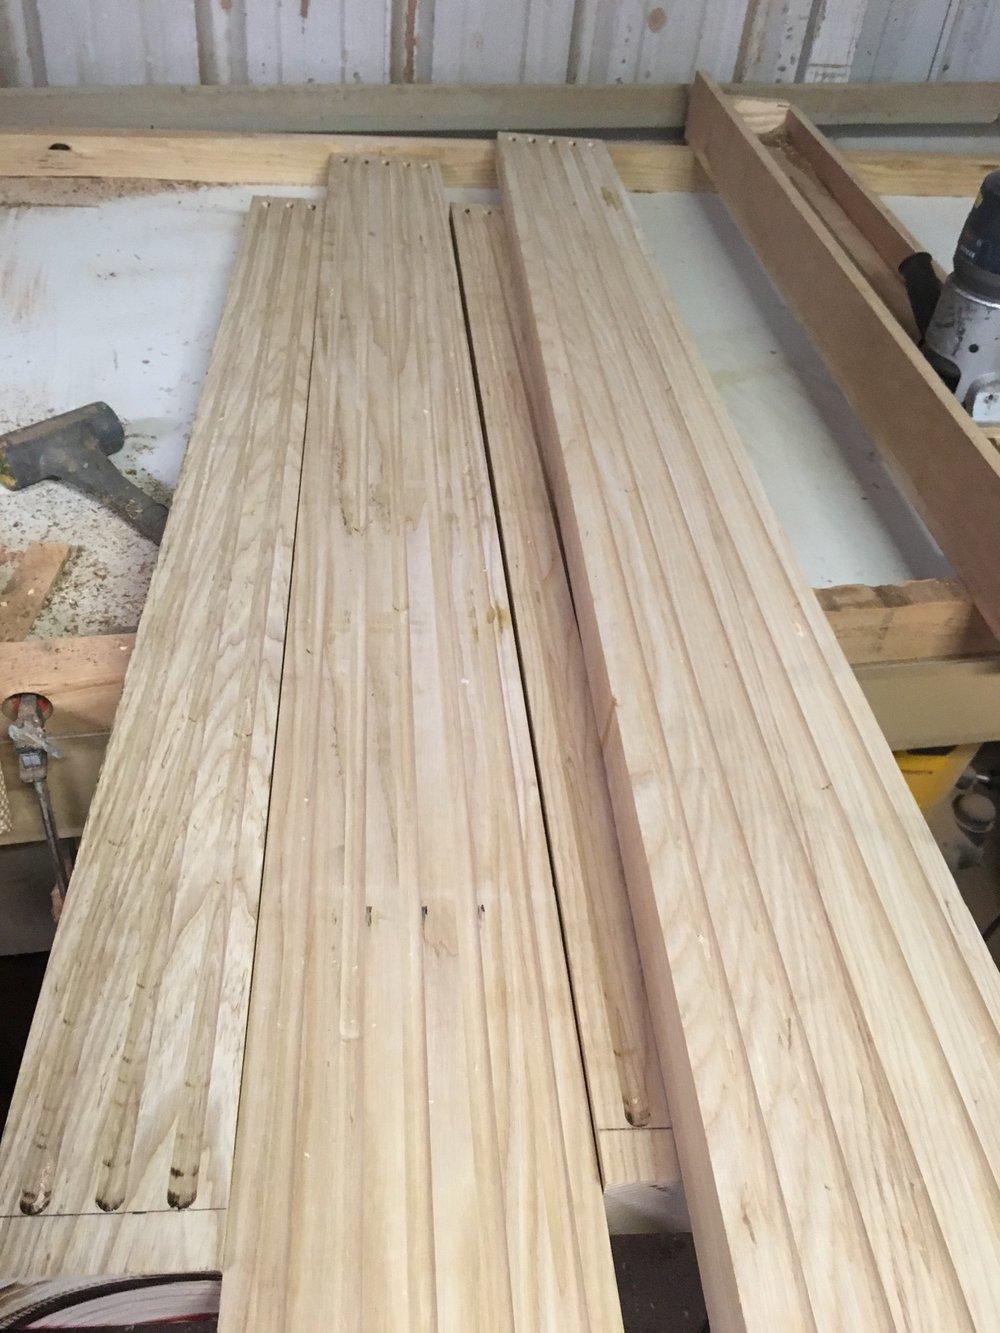 Ash bed parts. -